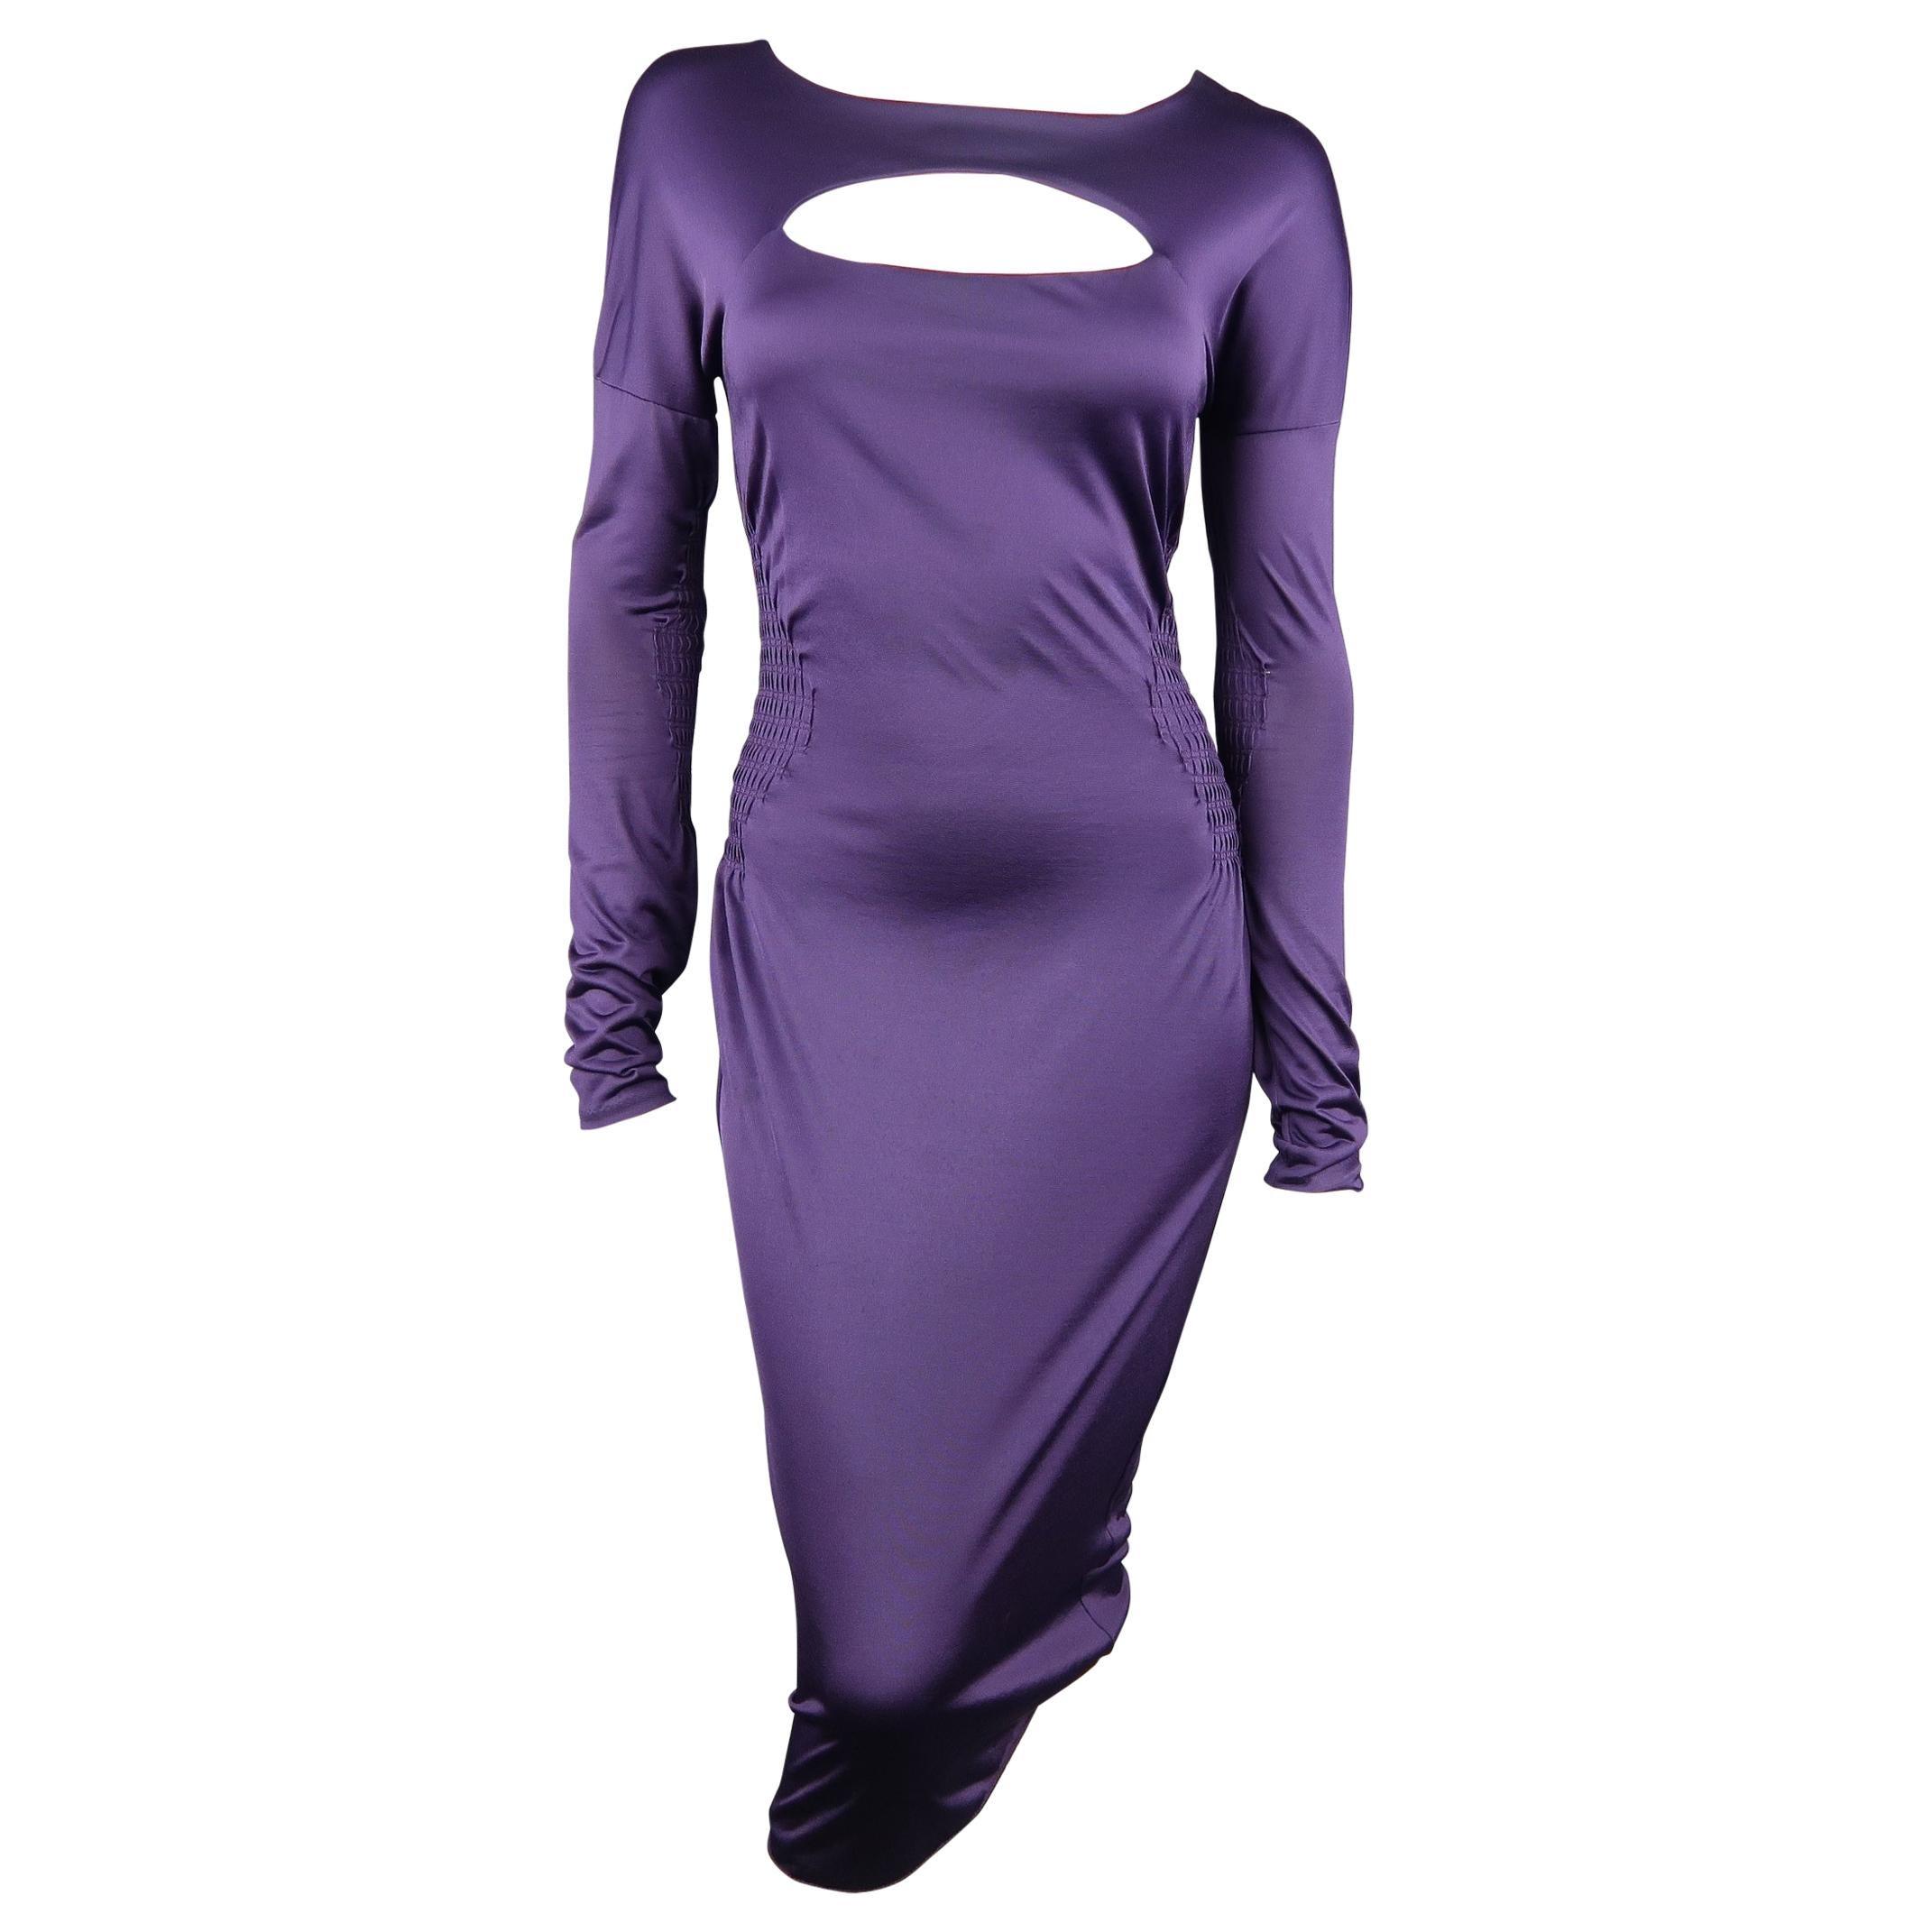 Gucci Purple Cocktail Dress